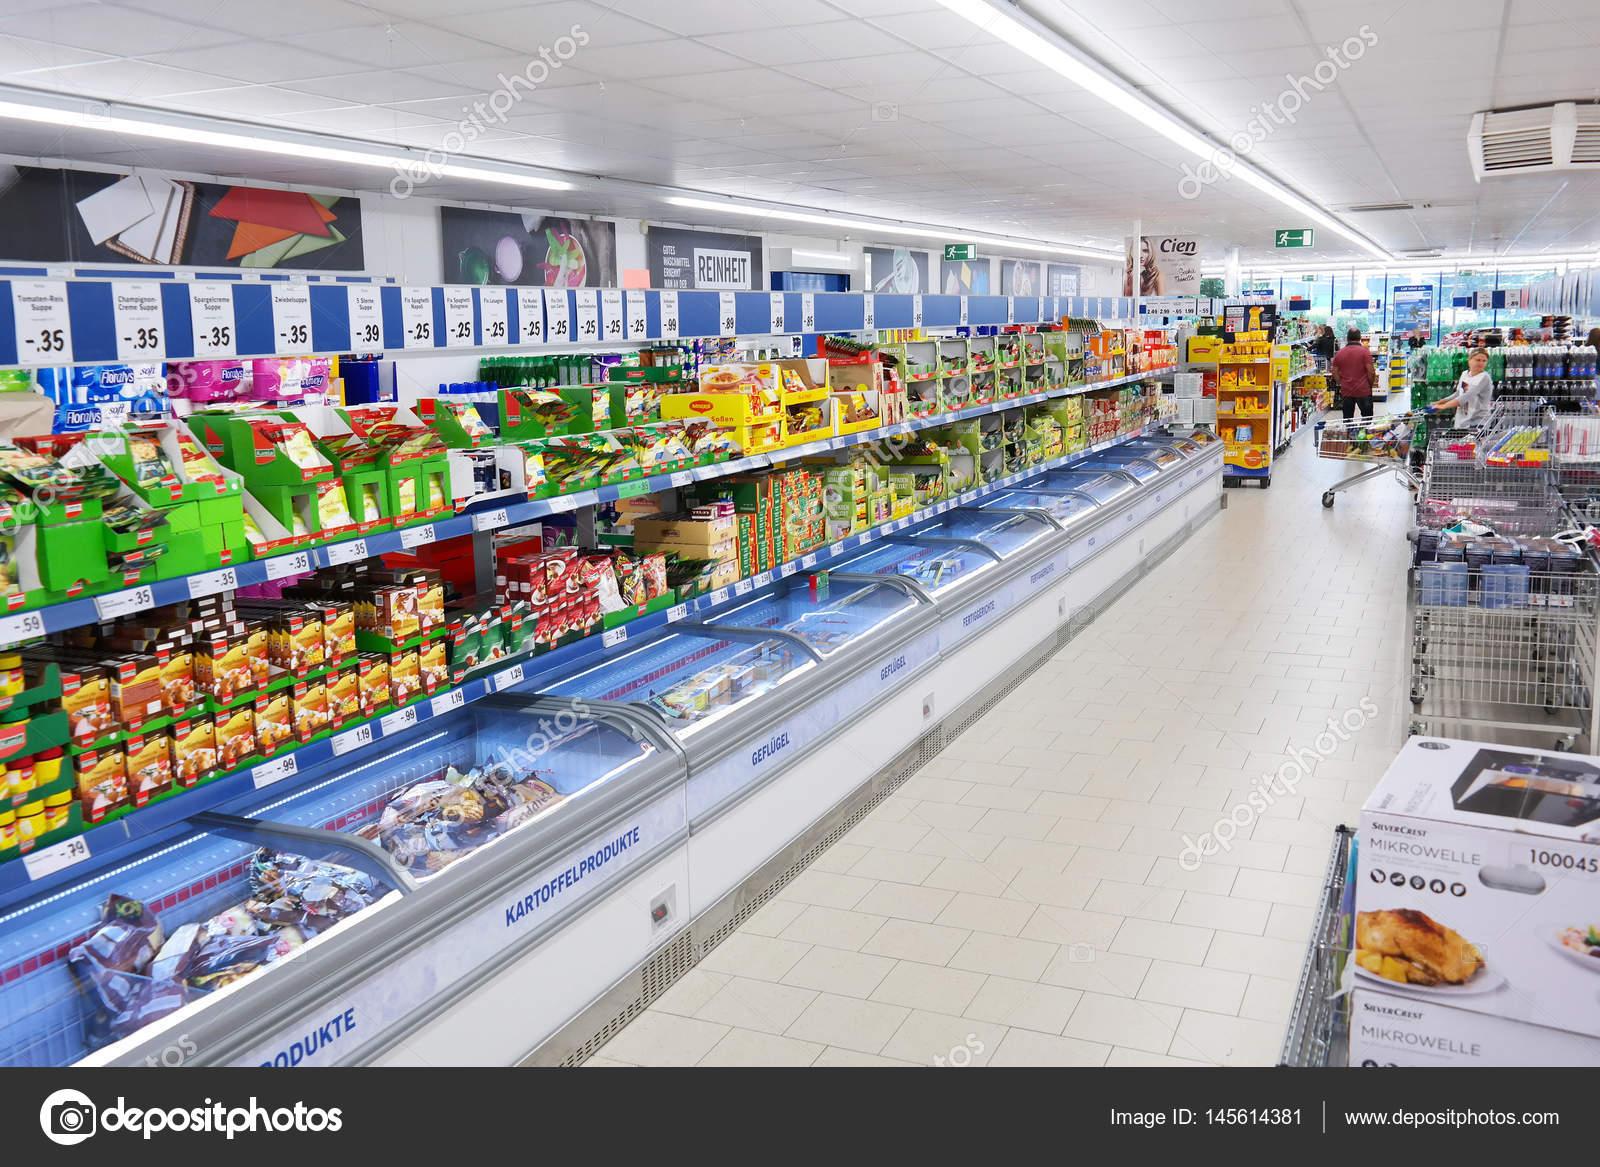 supermercados de descuento lidl foto editorial de stock defotoberg 145614381. Black Bedroom Furniture Sets. Home Design Ideas